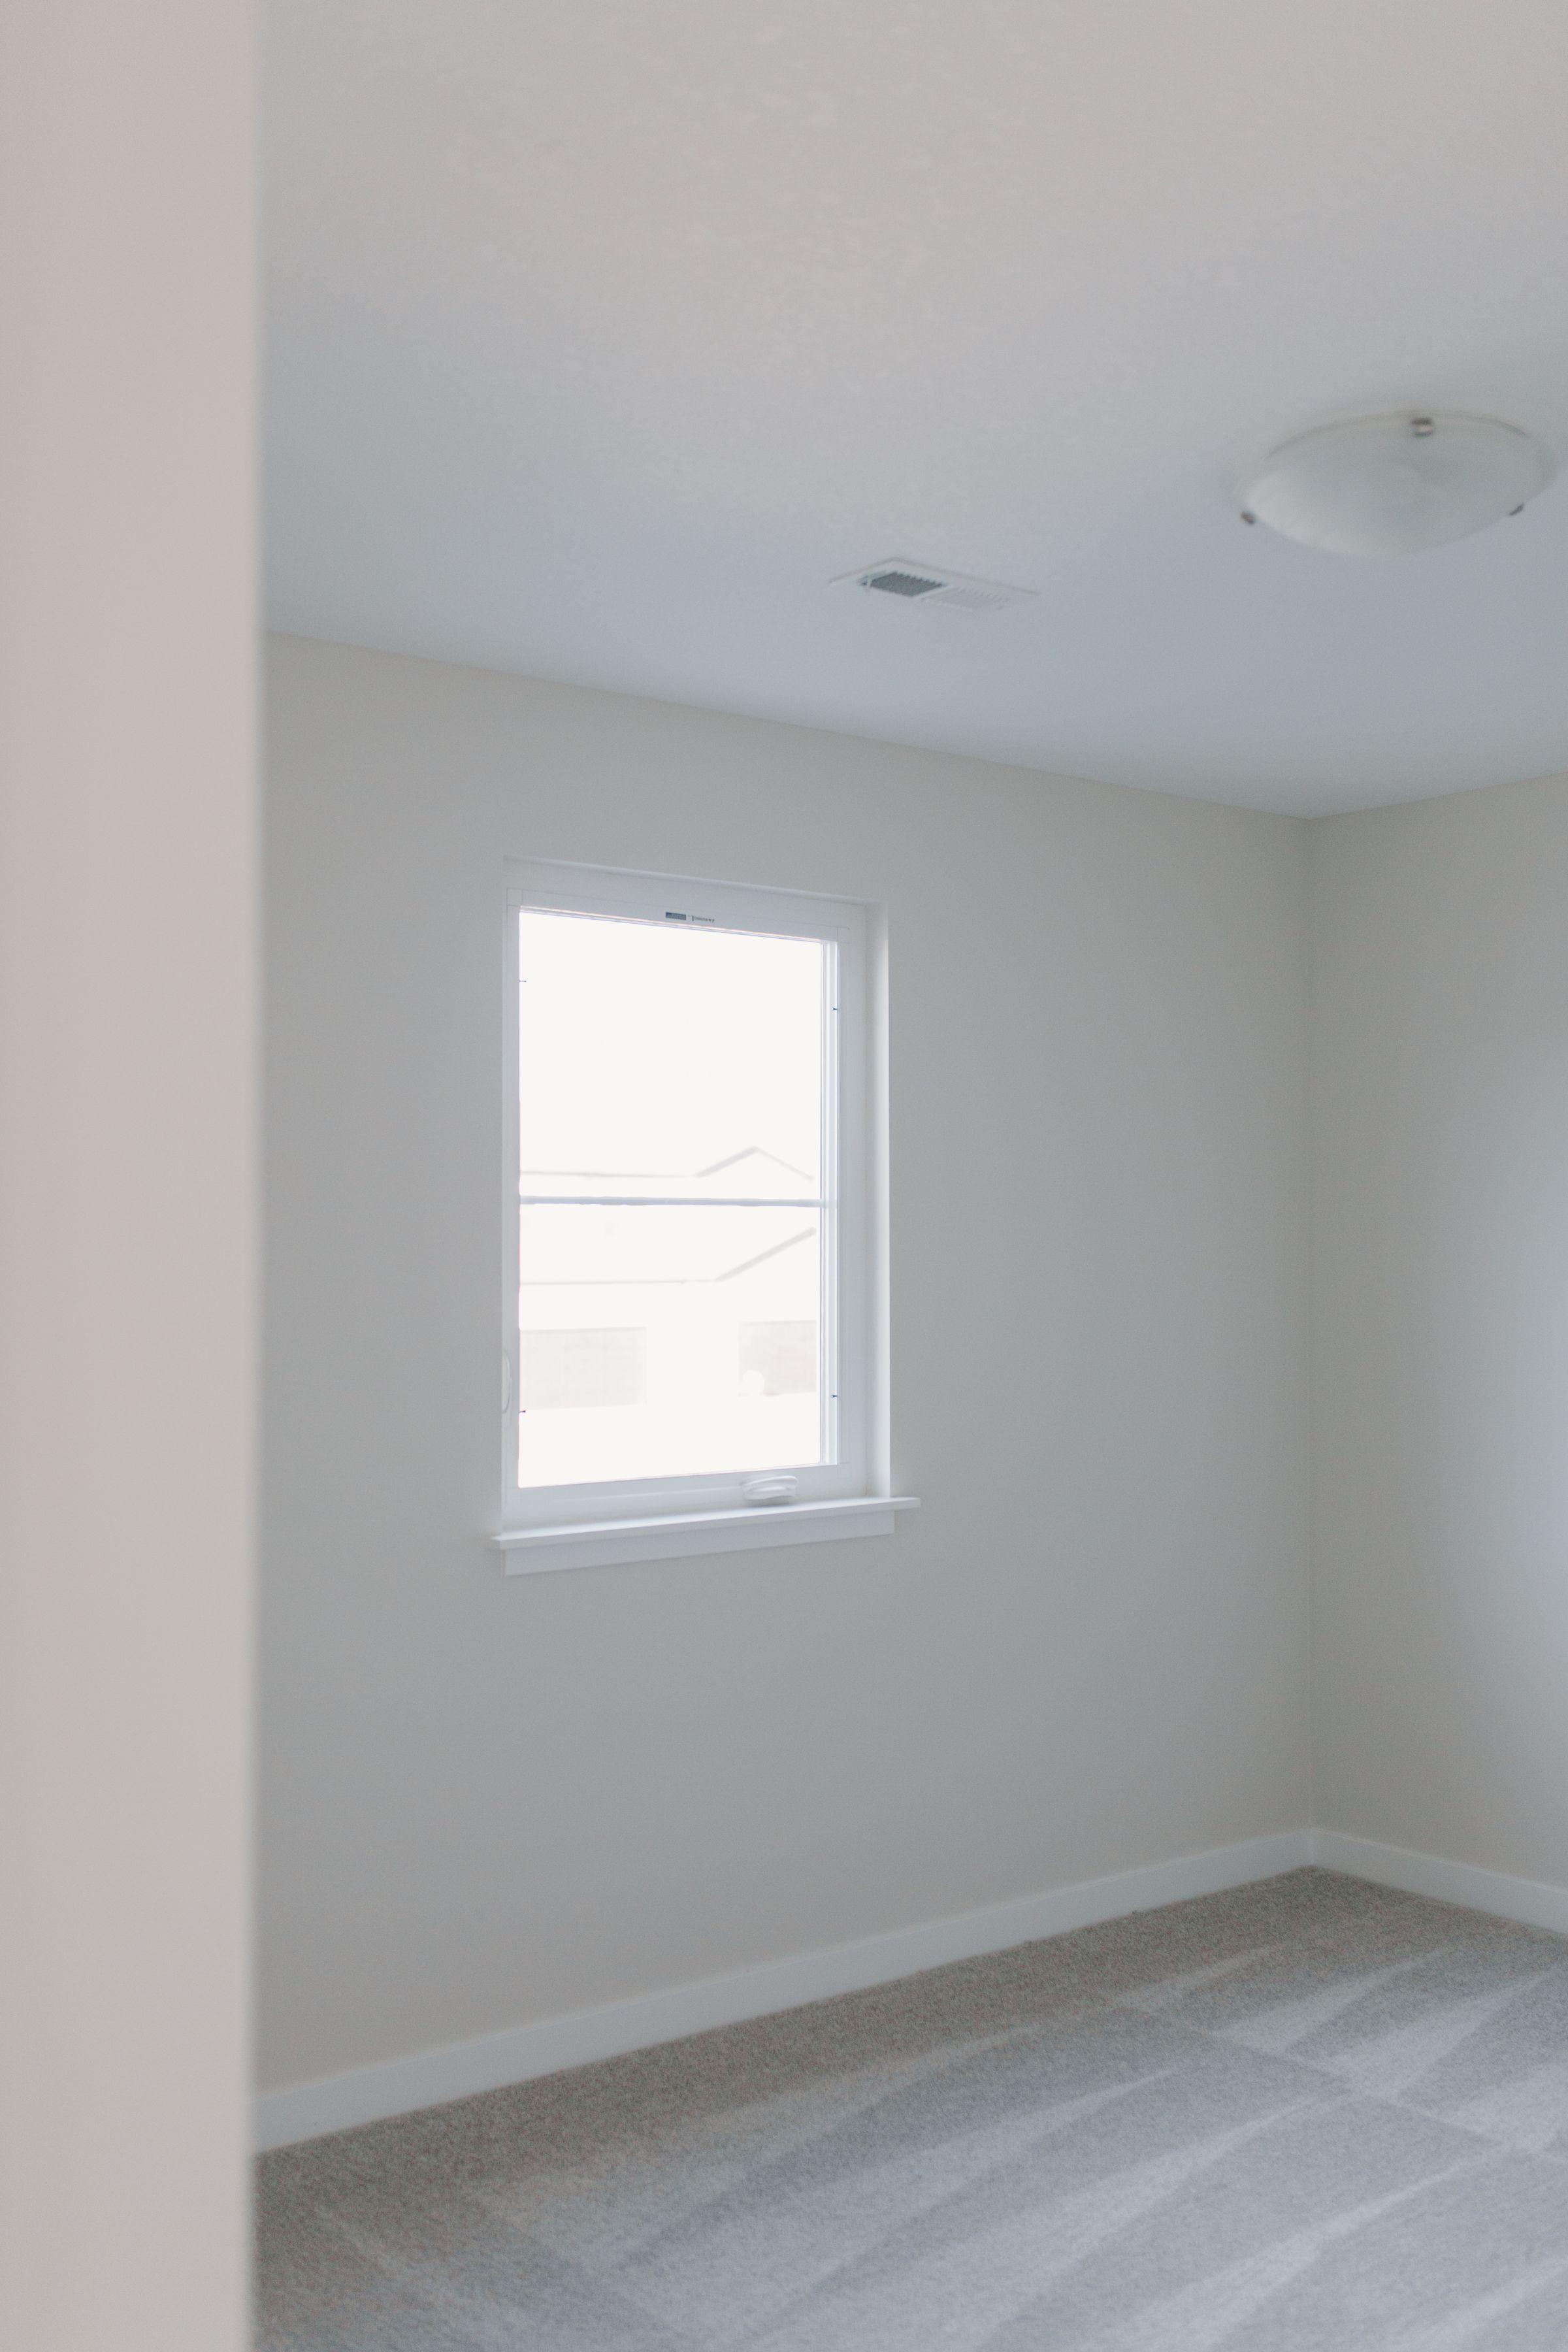 residential-warren-county-iowa-0-acres-listing-number-15138-4-2020-12-28-170351.jpg